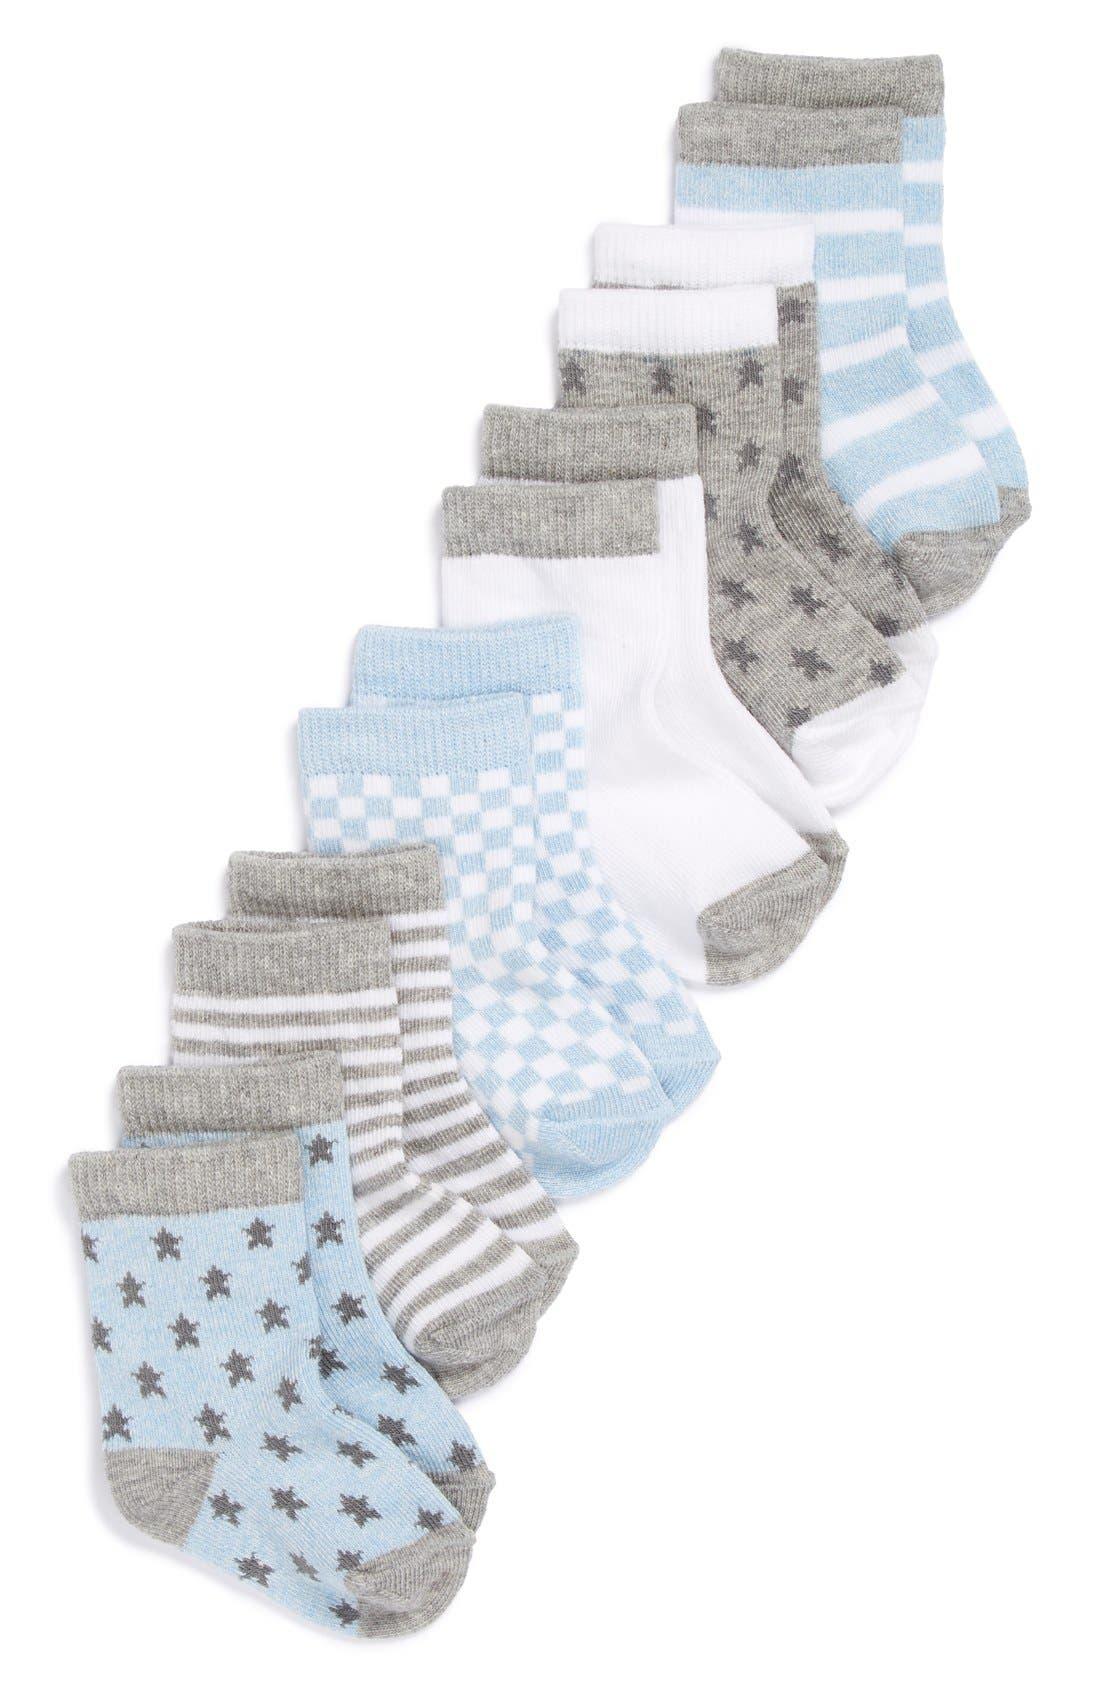 Main Image - Nordstrom Baby Crew Socks (Baby) (6-Pack)